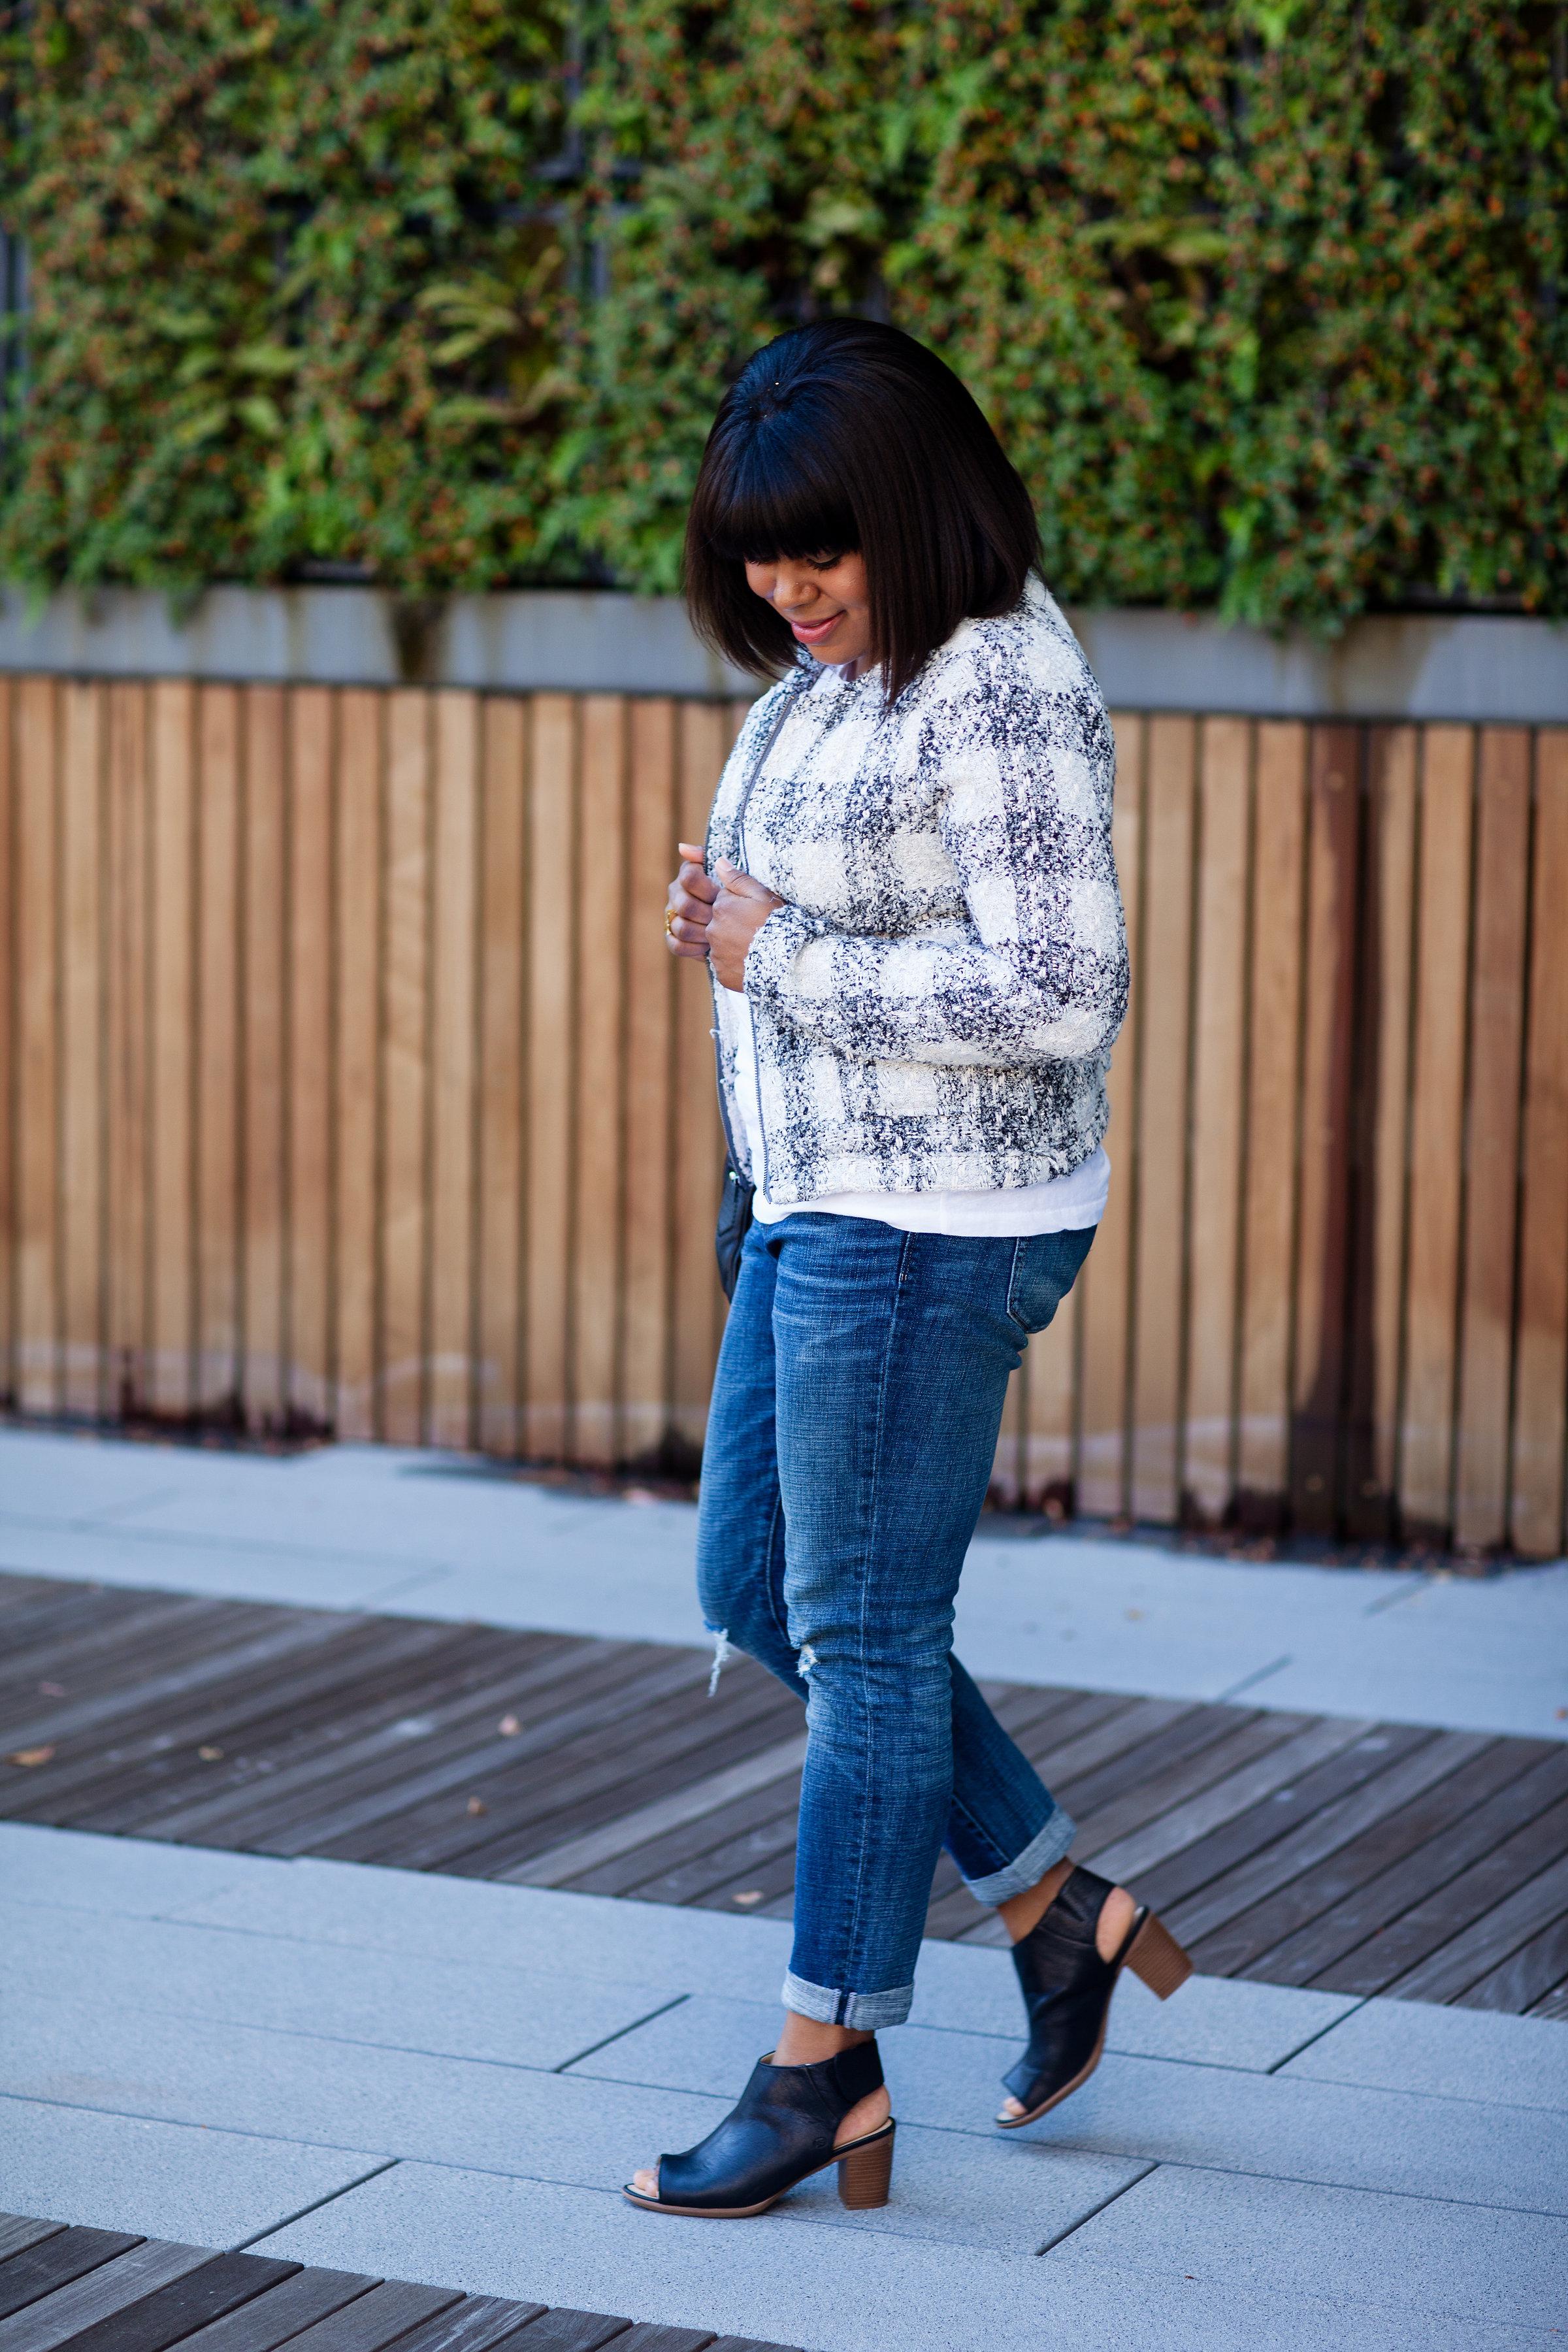 Tweed jacket with jeans.